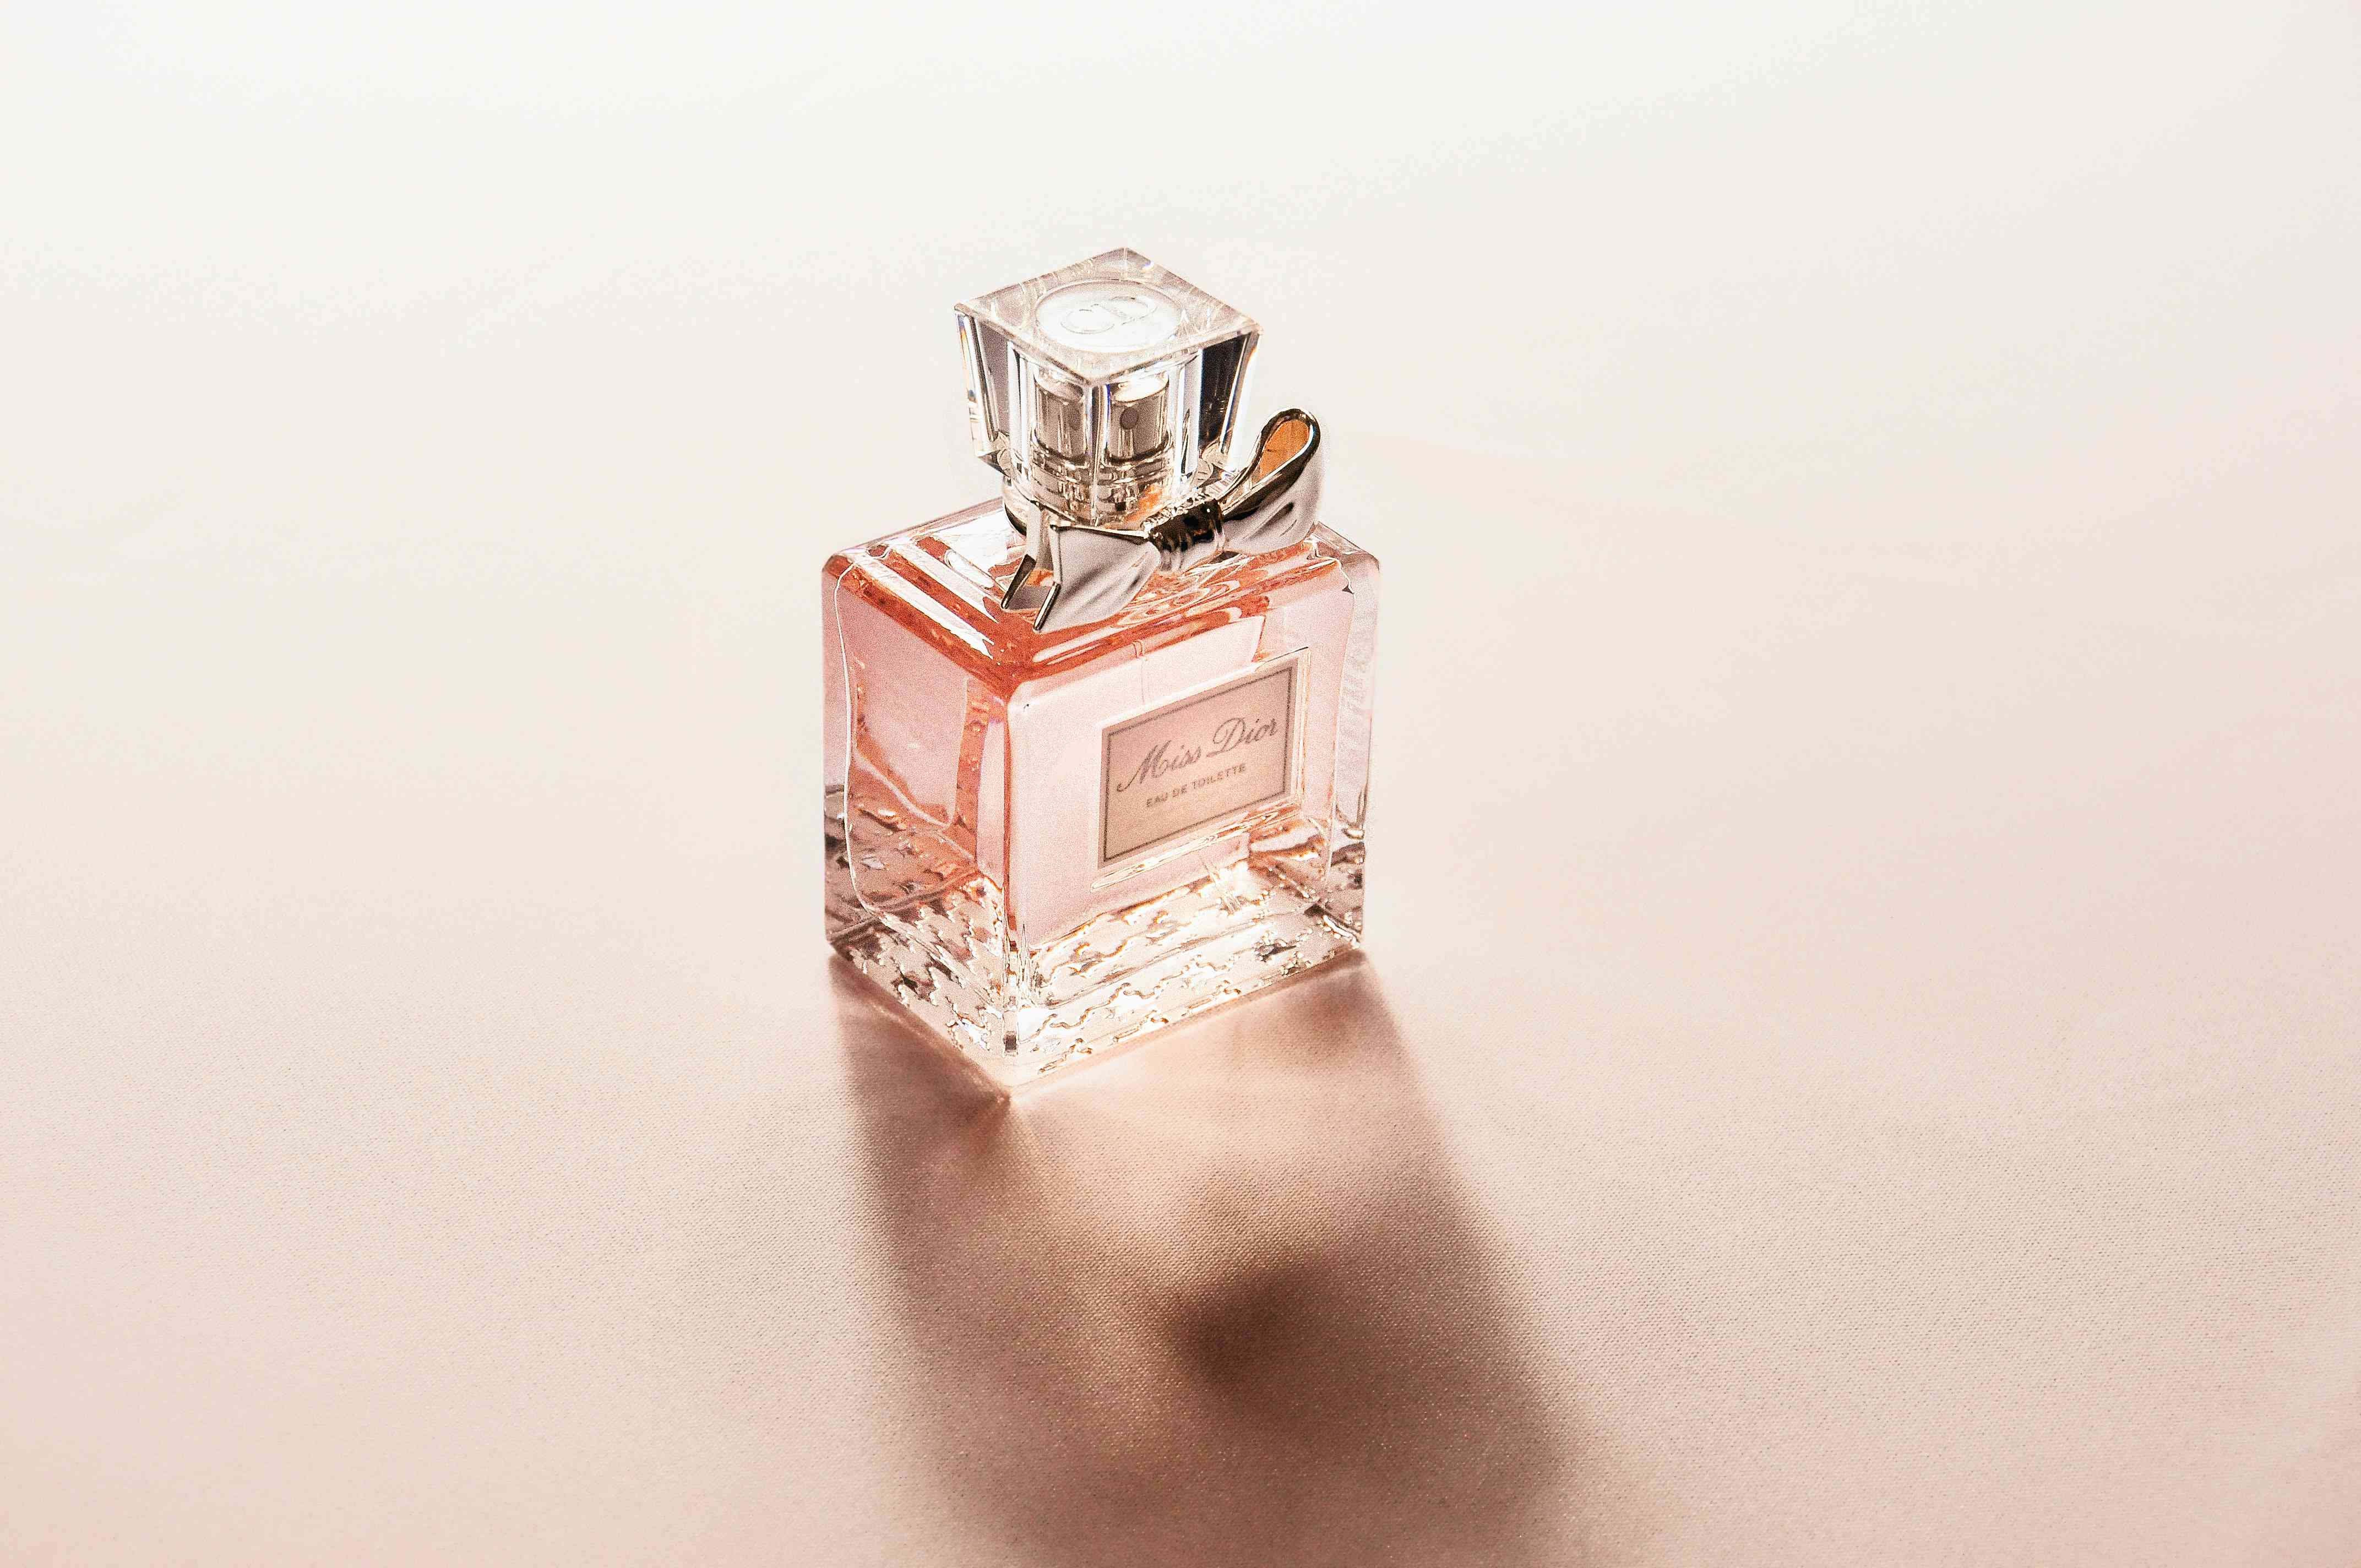 How Long Does Perfume Last? - How to Make Perfume Last Longer